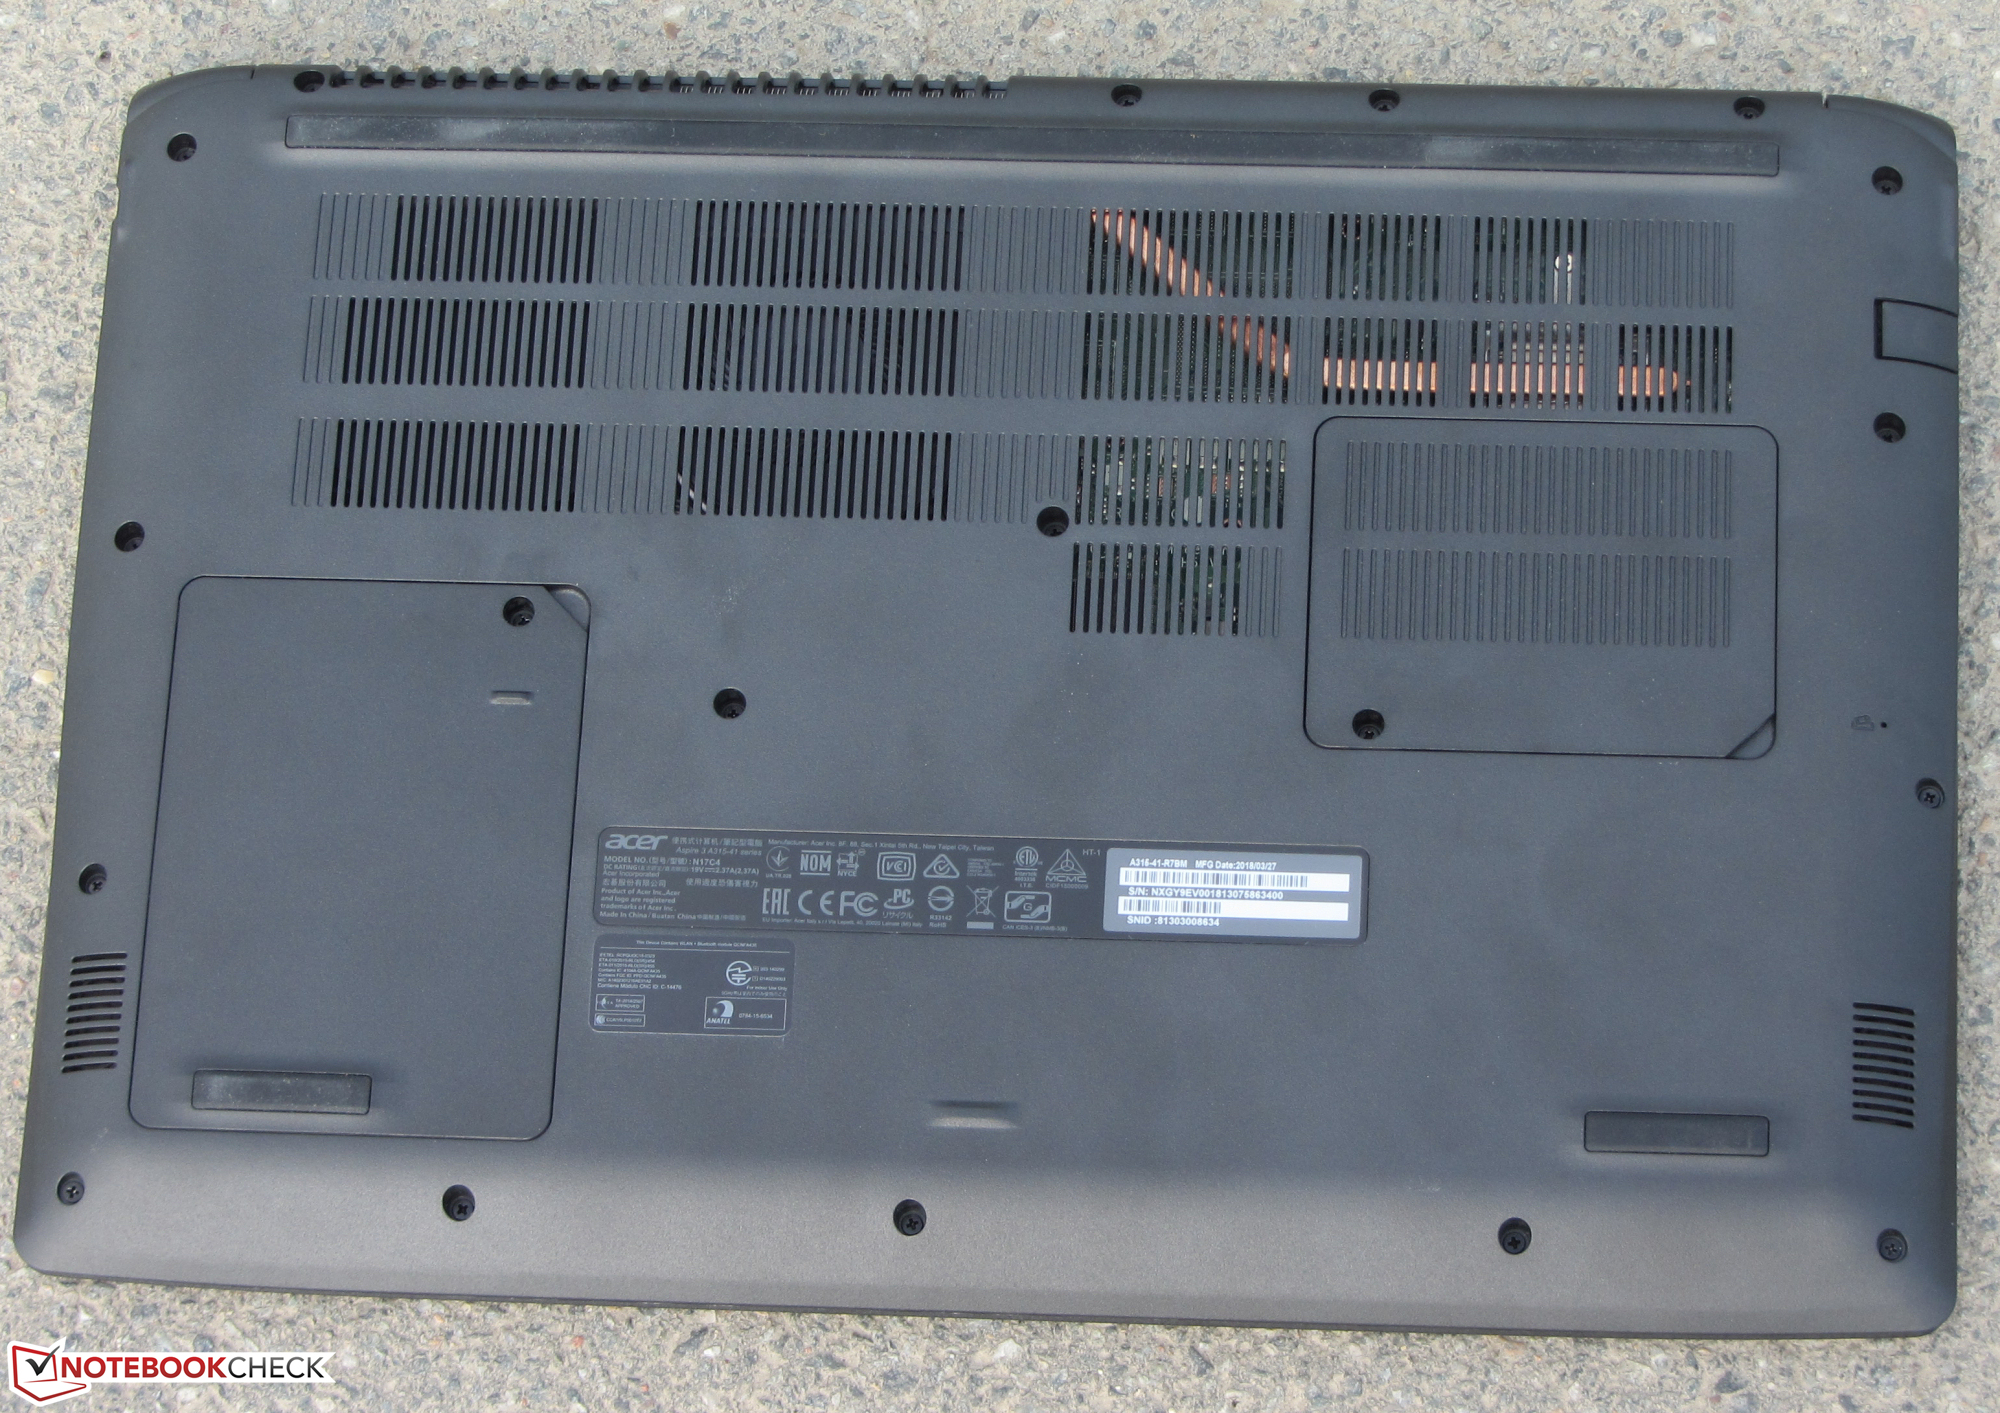 Acer Aspire 3 A315-41 (Ryzen 3 2200U, Vega 3, SSD, FHD) Laptop